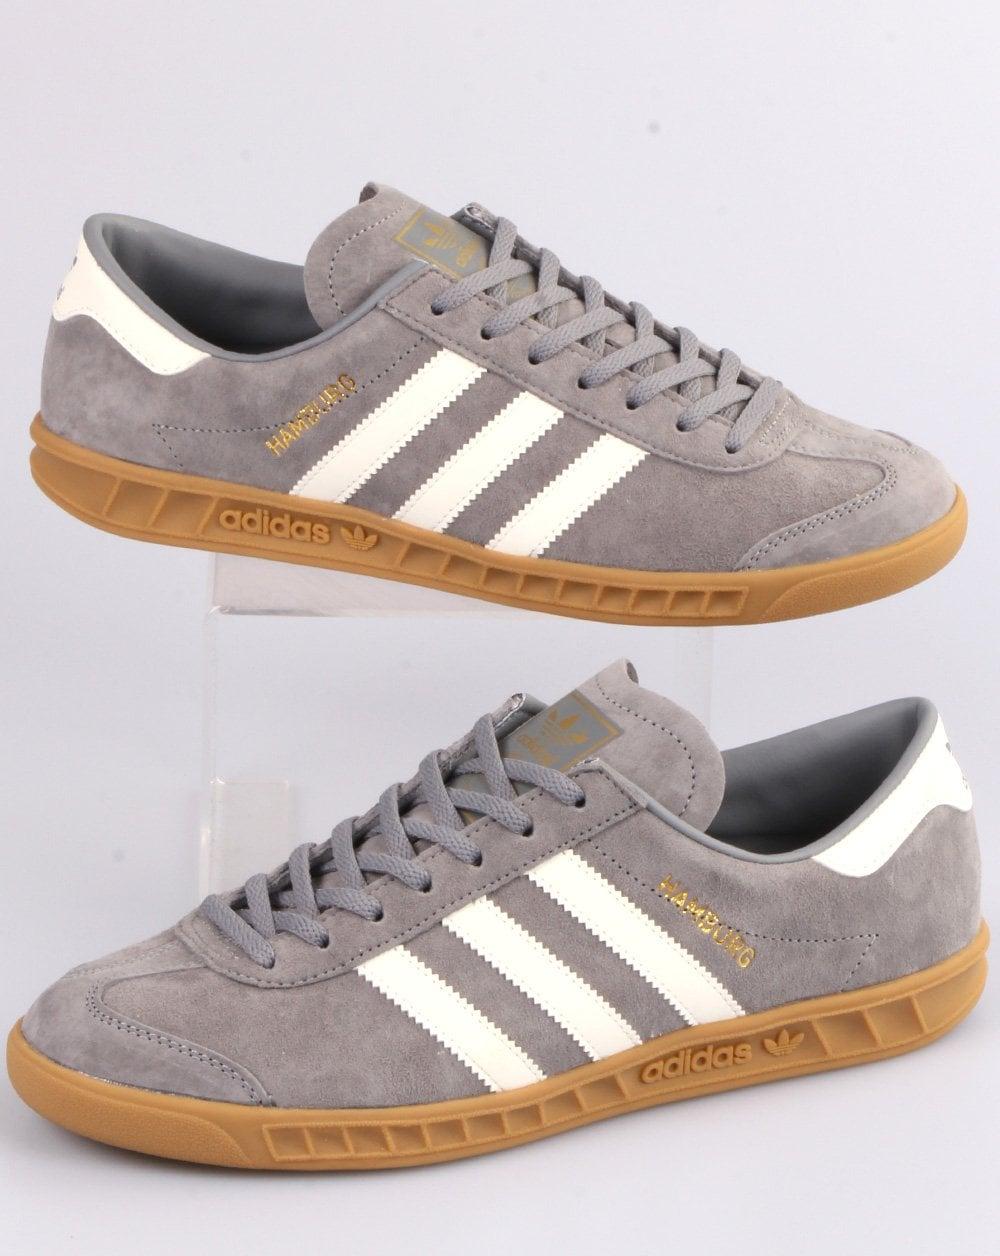 Adidas Hamburg Trainers Grey/Off White